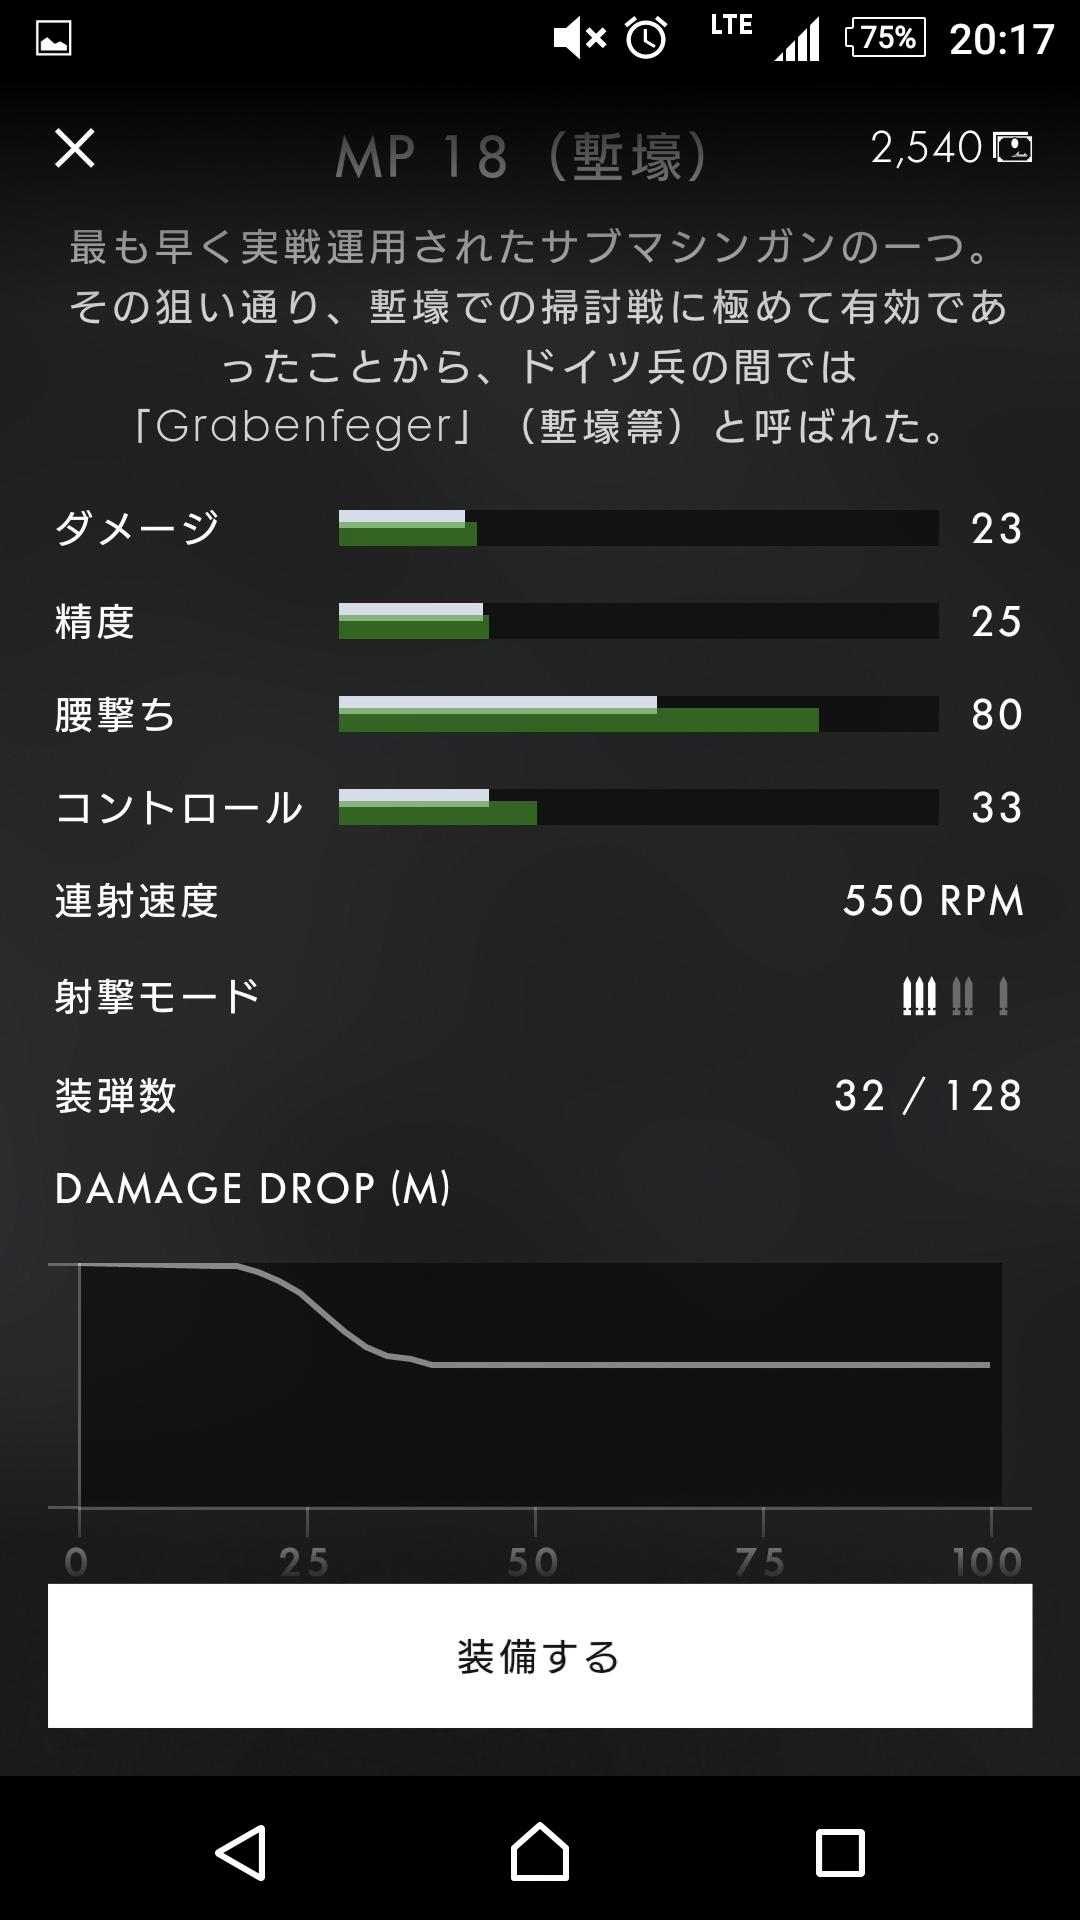 BF1_MP18